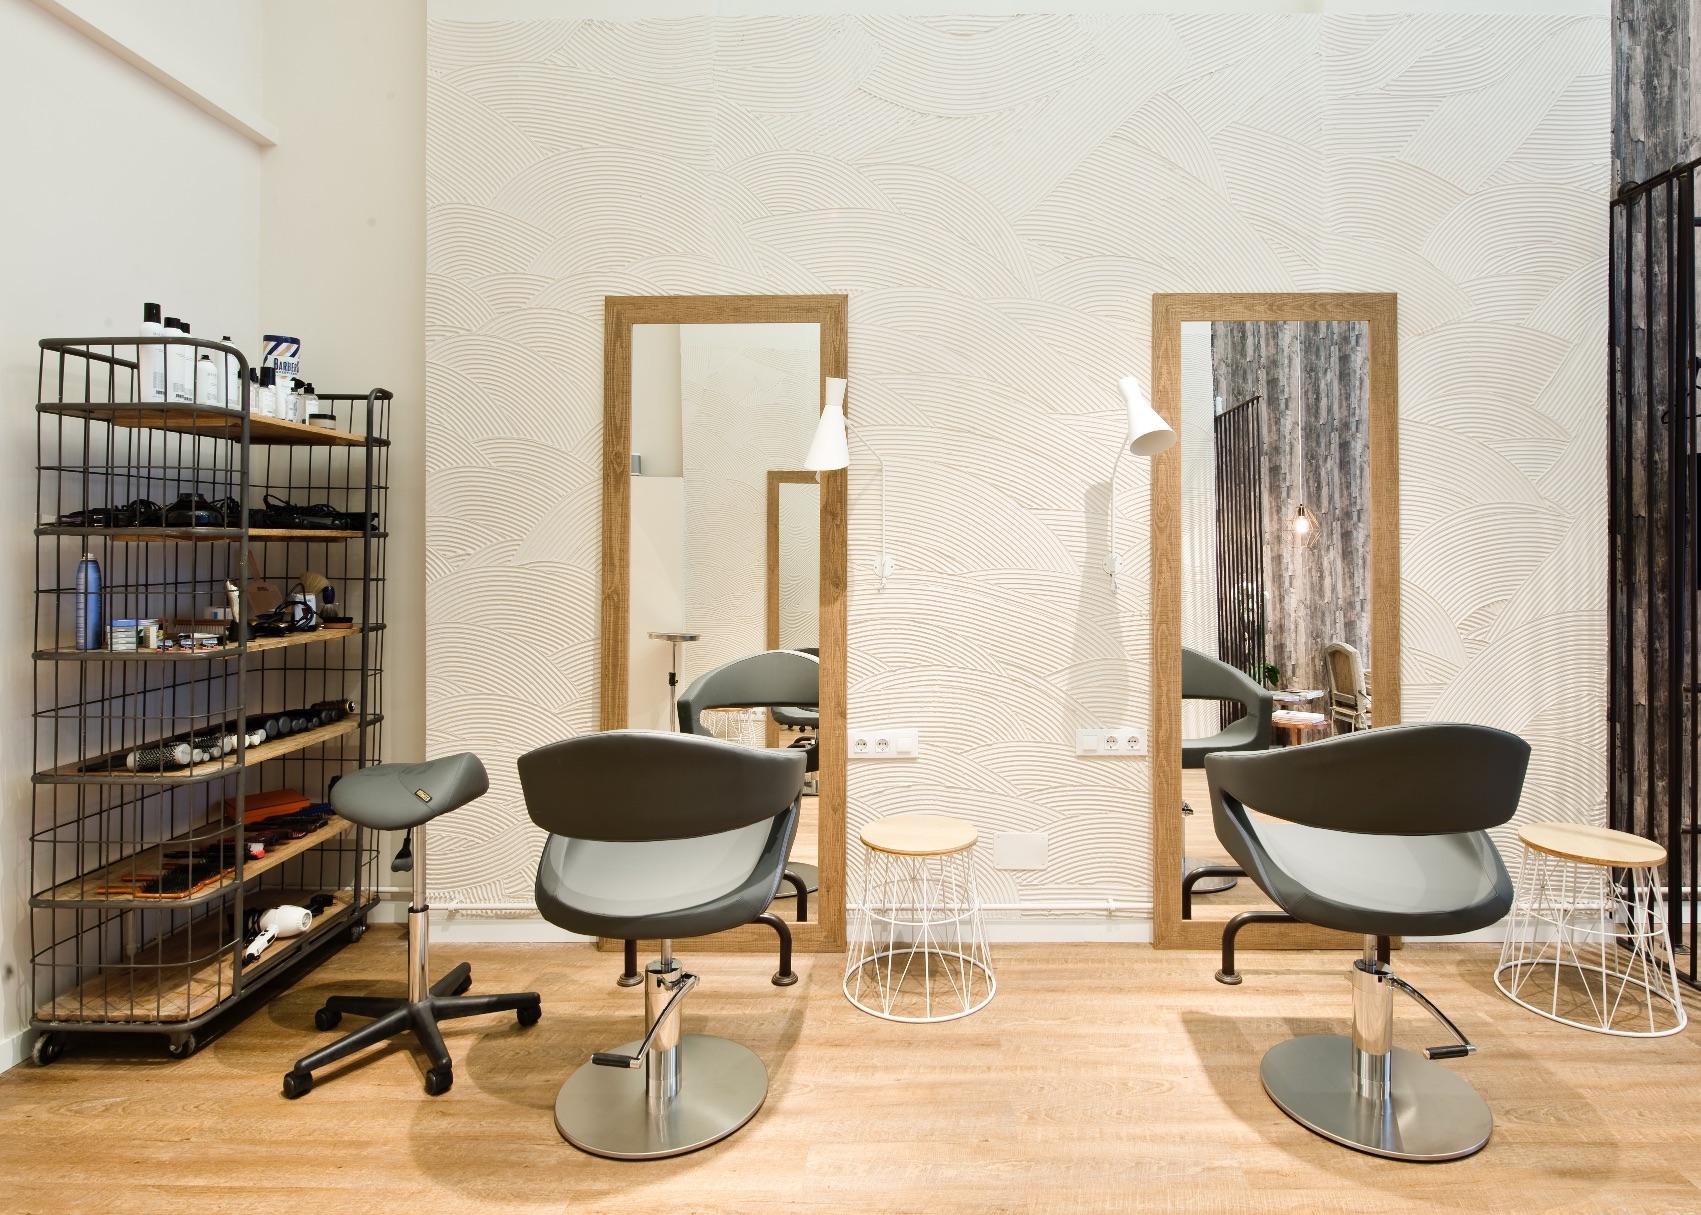 salon-peluqueria-barcelona-alisado-goa-5